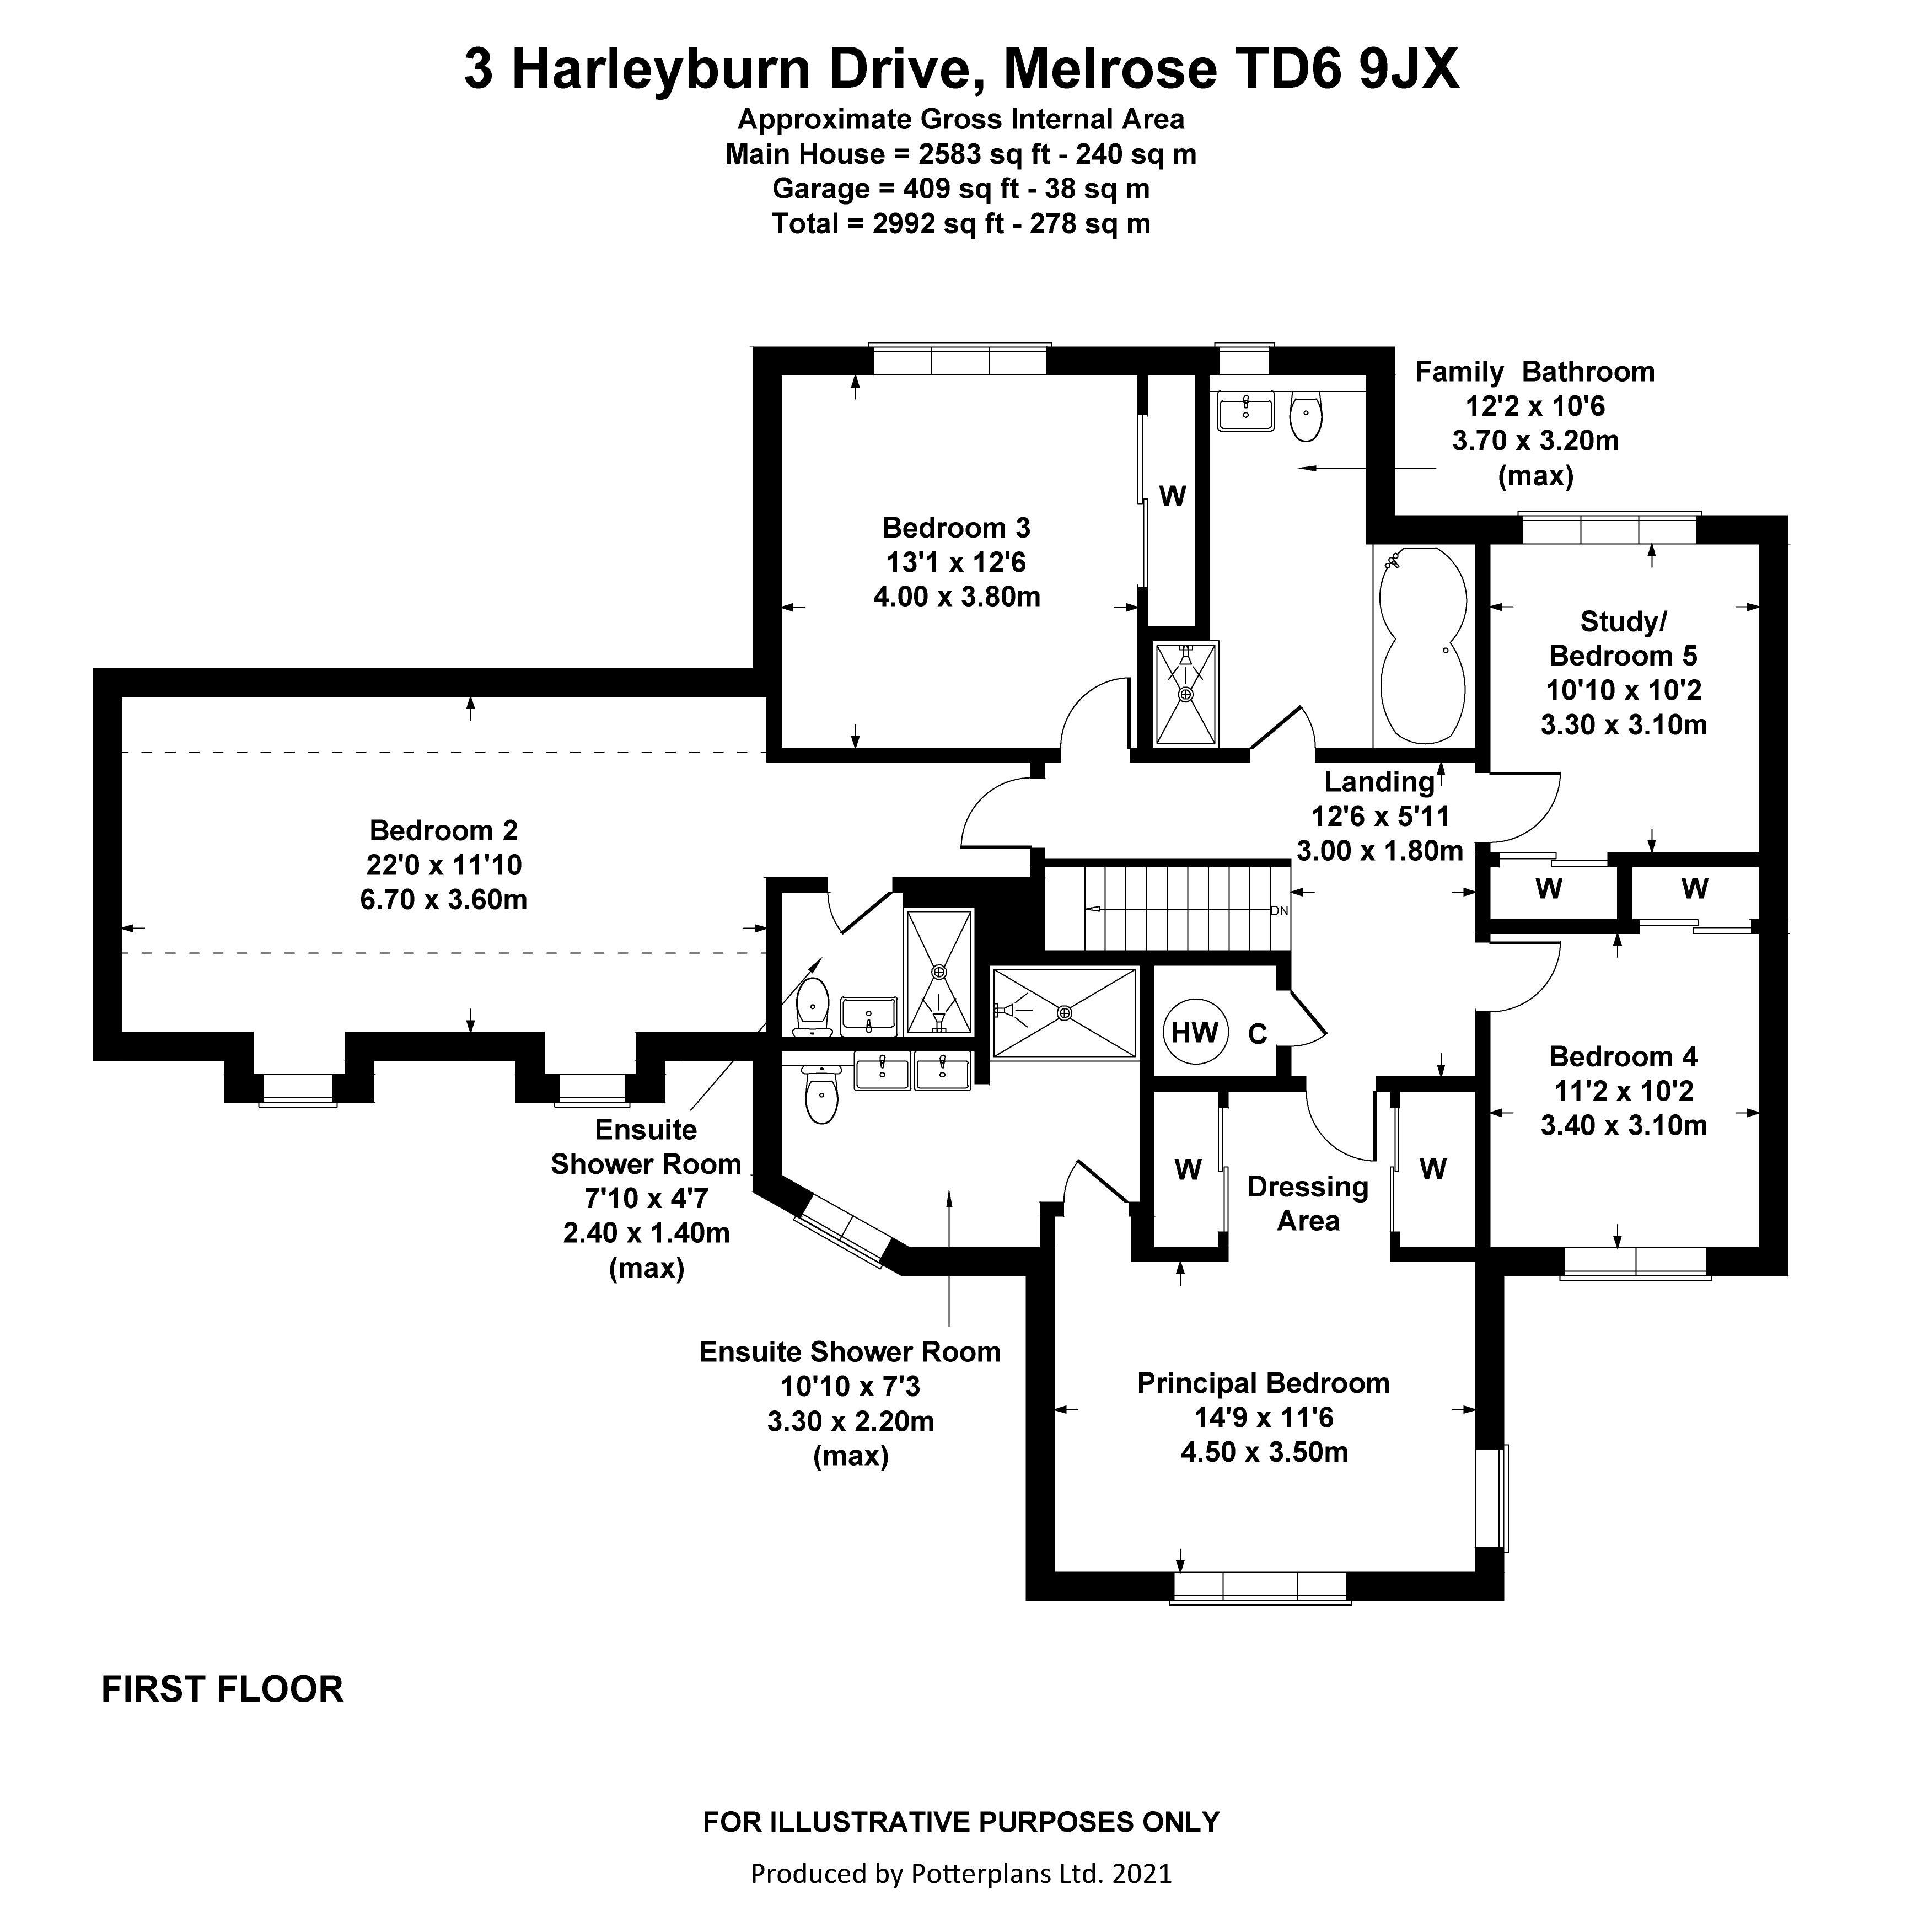 3 Harleyburn Drive First Floor